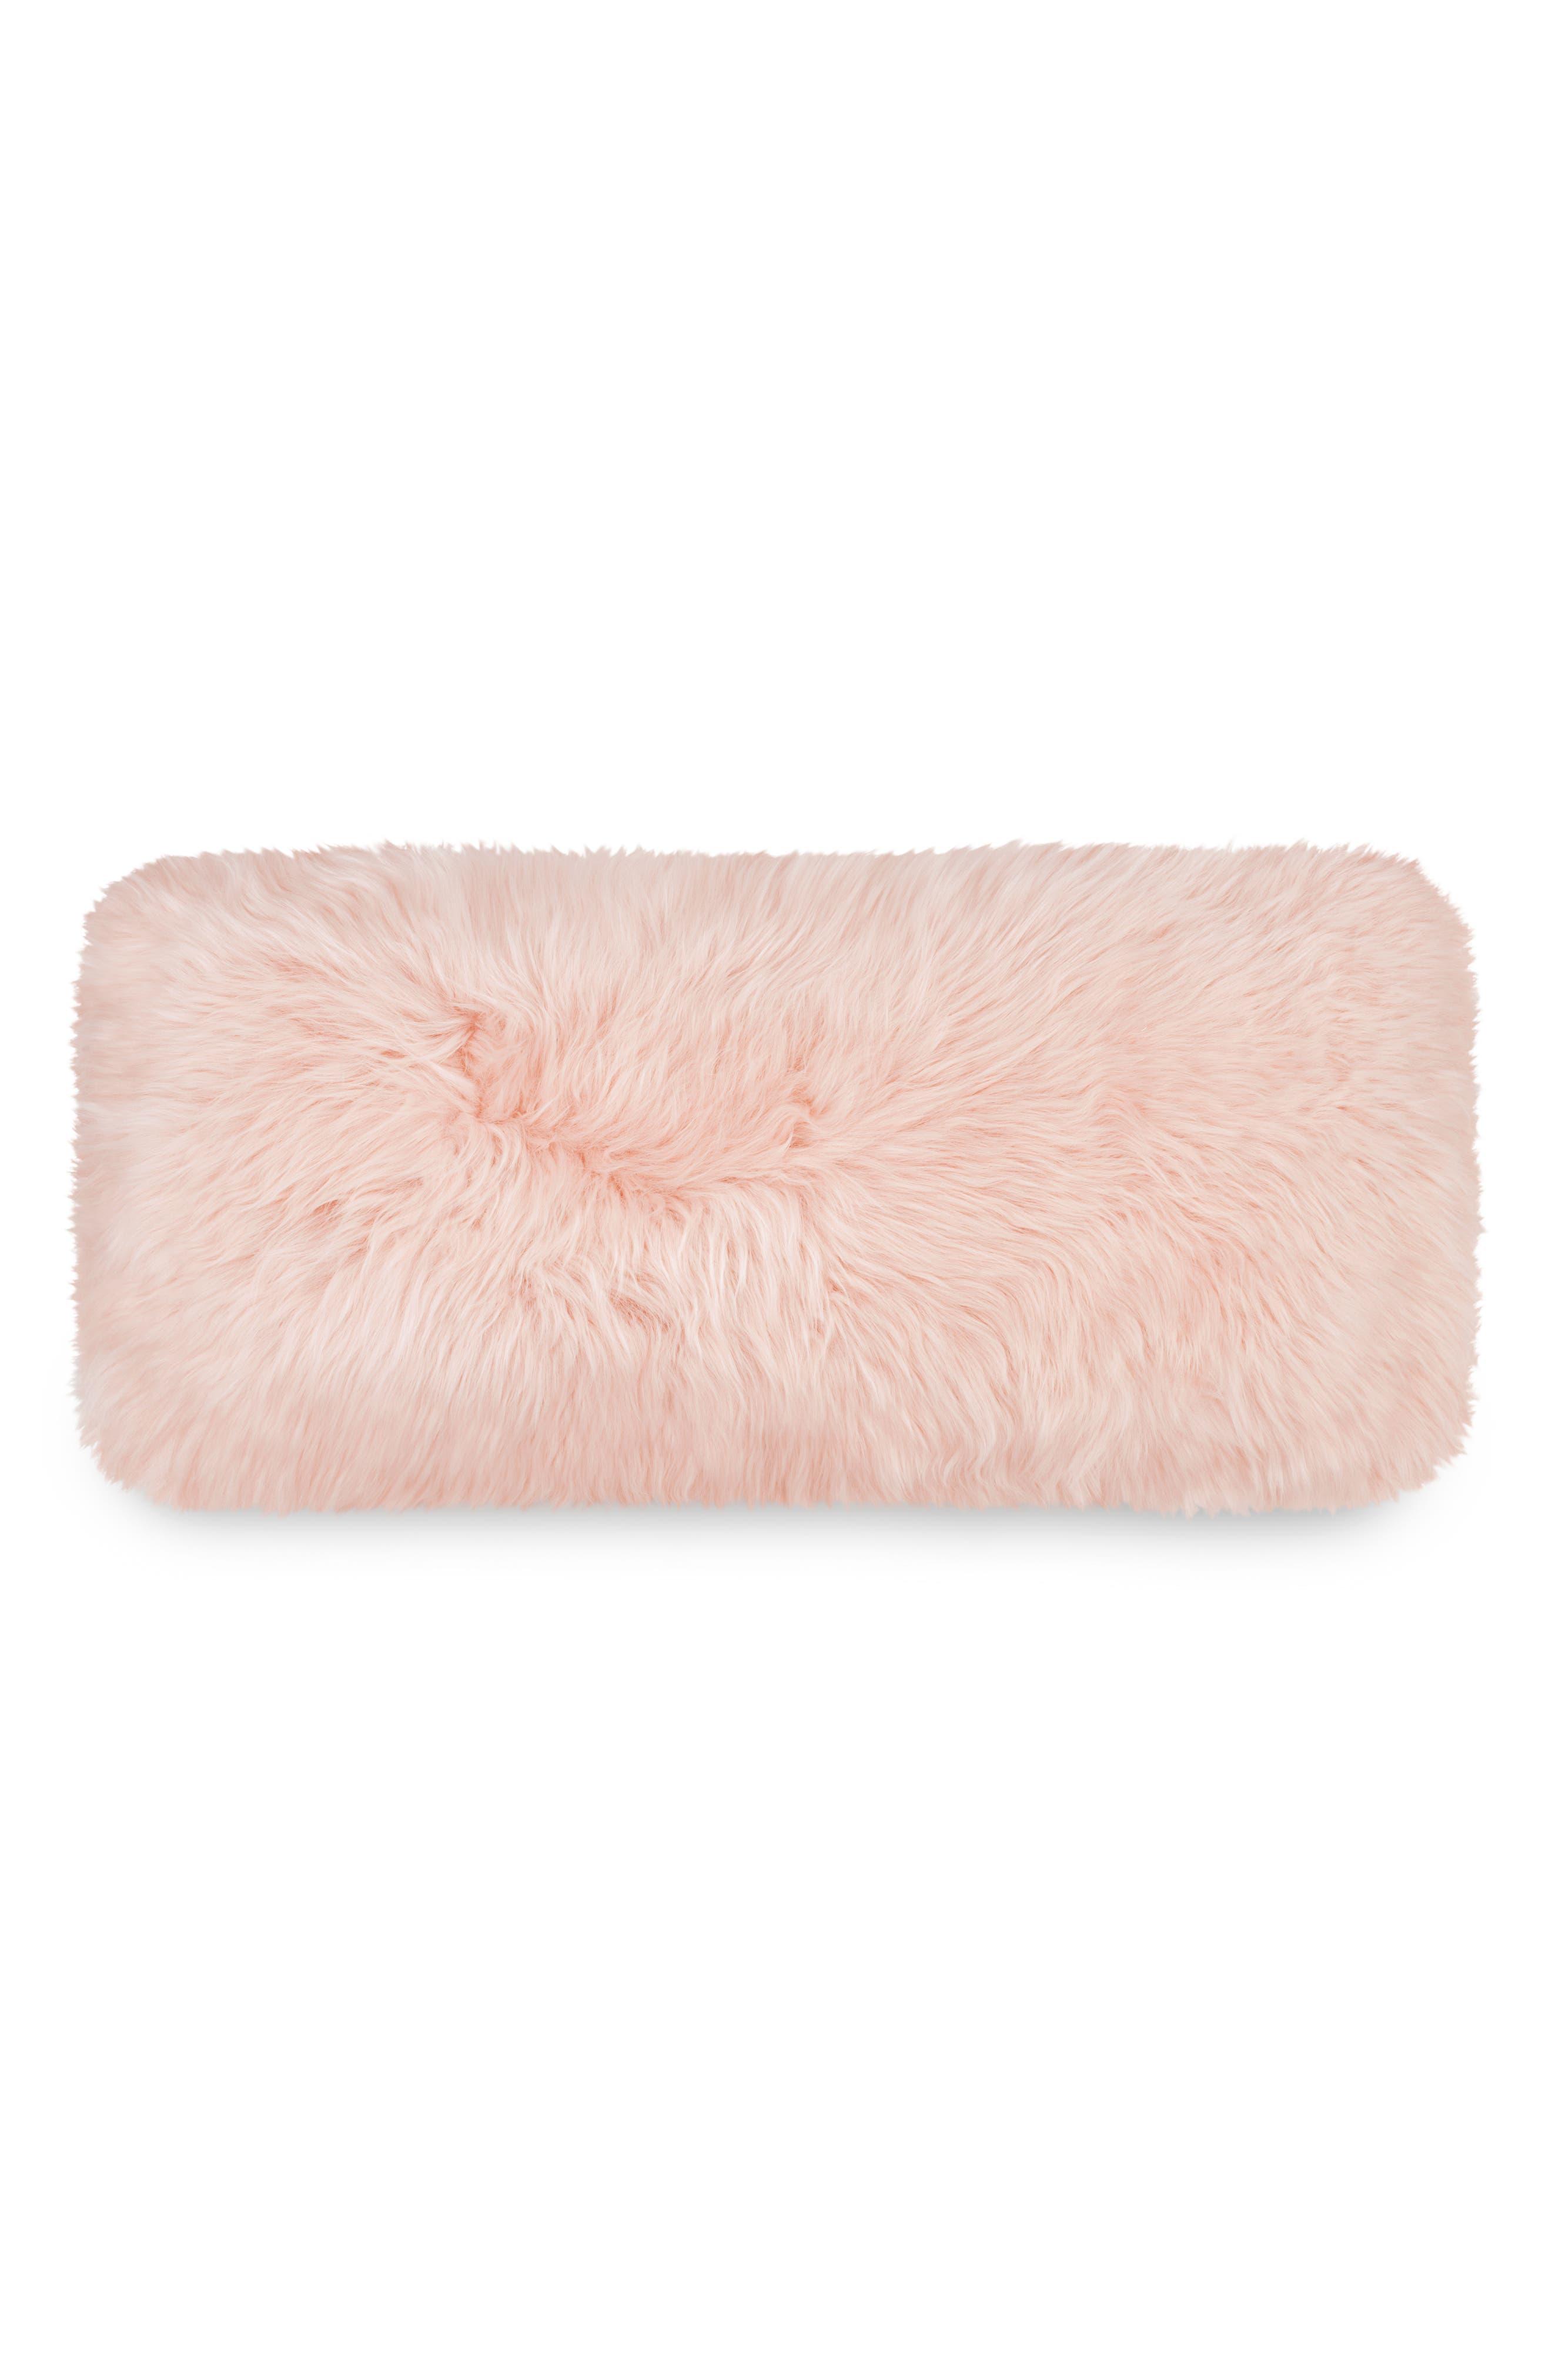 Genuine Sheepskin Accent Pillow,                             Alternate thumbnail 2, color,                             Blush